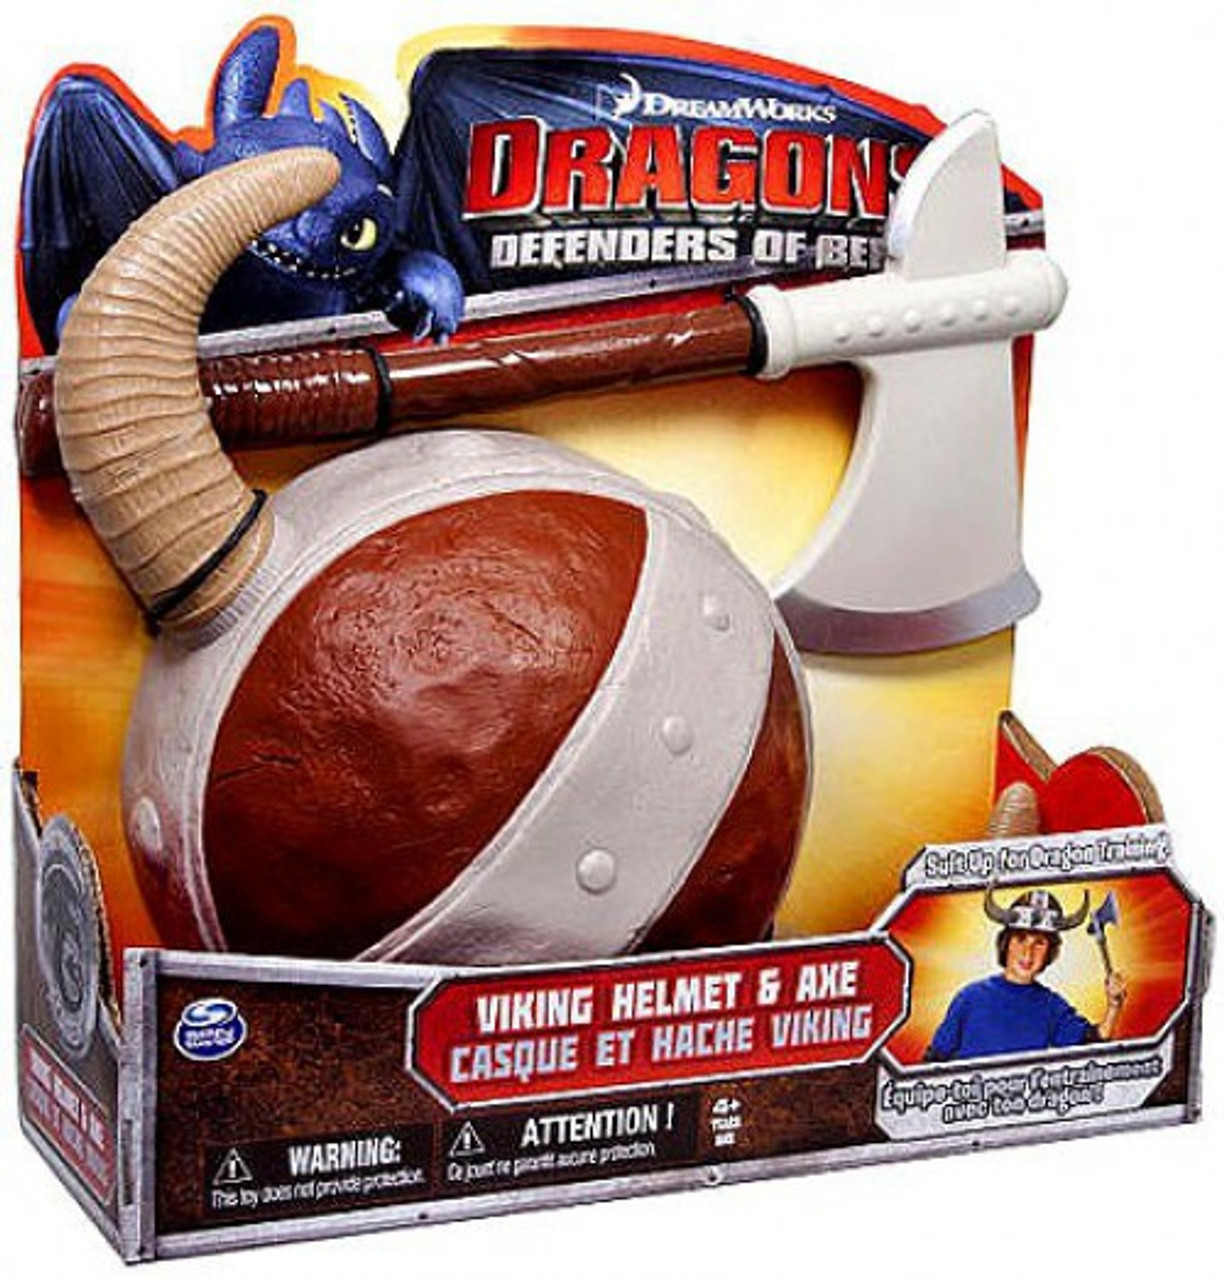 How to Train Your Dragon Dragons Defenders of Berk Viking Helmet & Axe Exclusive Roleplay Toy